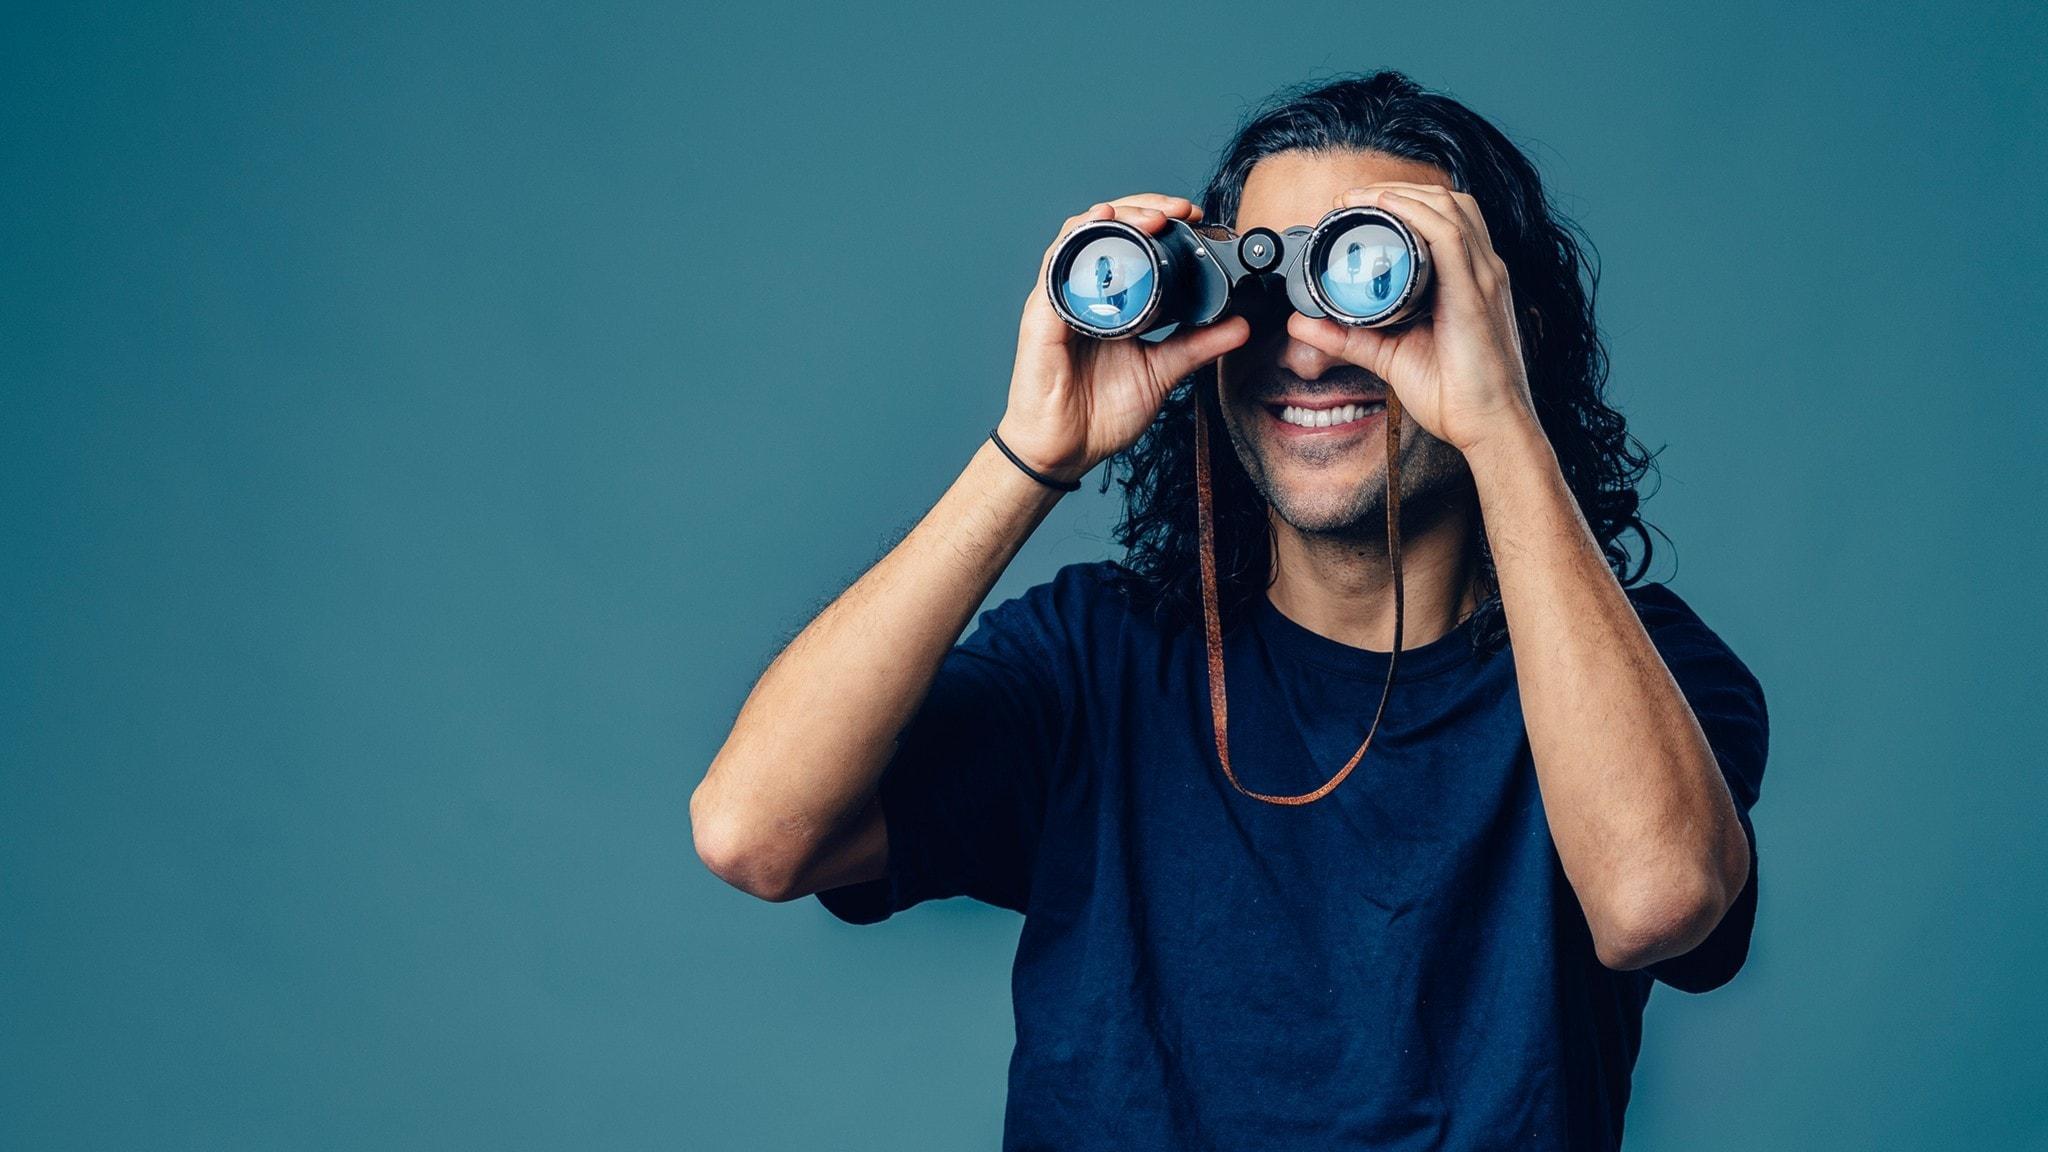 Farzad spanar i en kikare. Foto: Alexander Donka